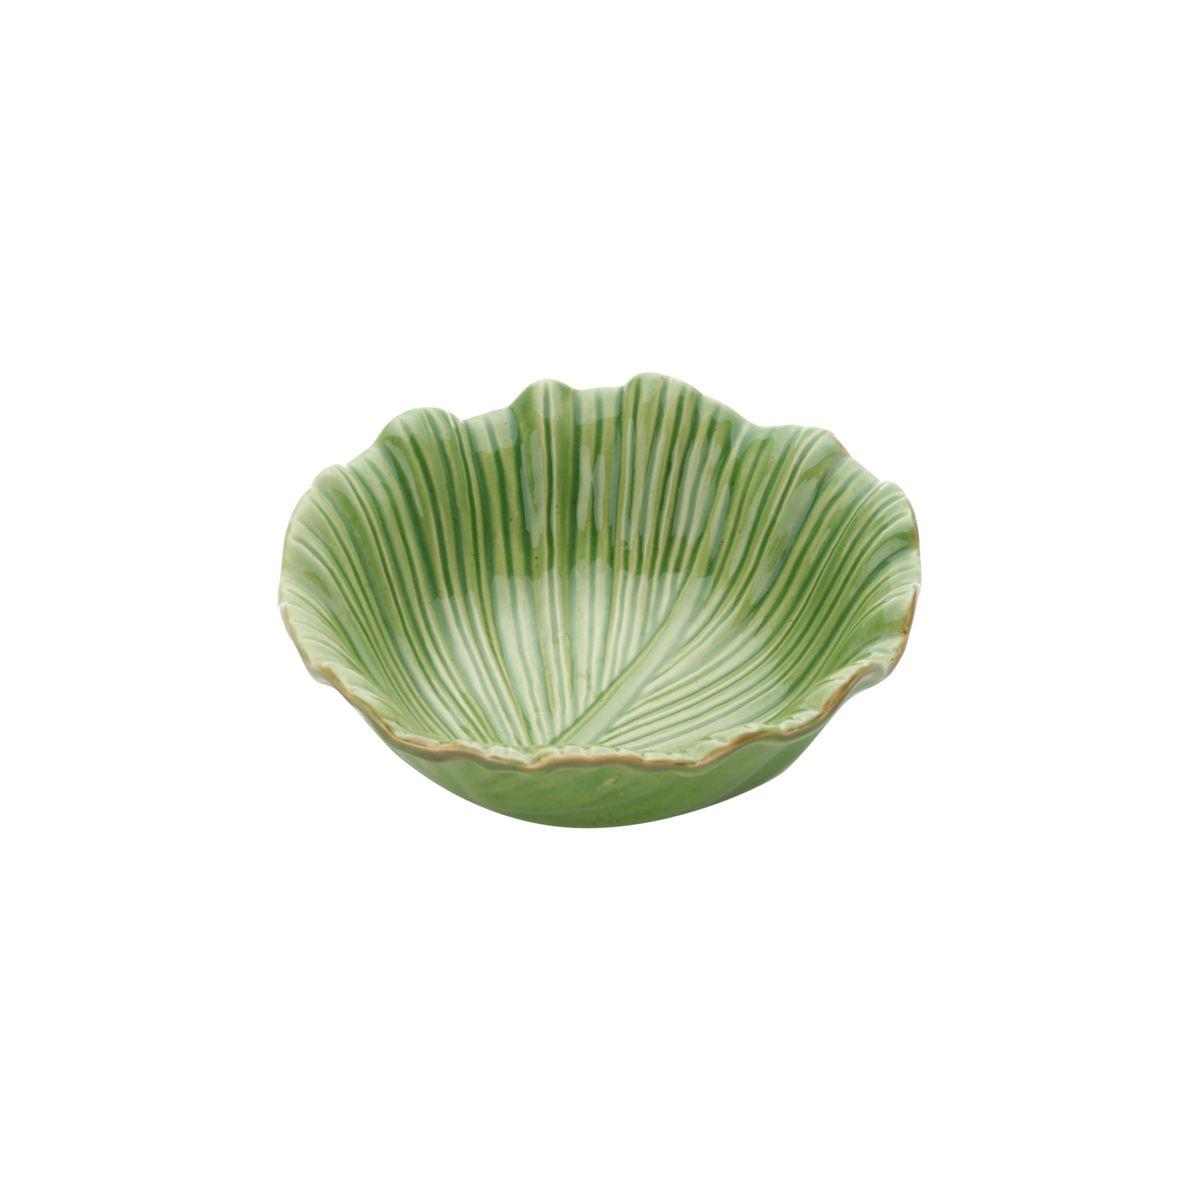 Centro de mesa 17,5 cm de cerâmica verde Banana Leaf Lyor - L4126